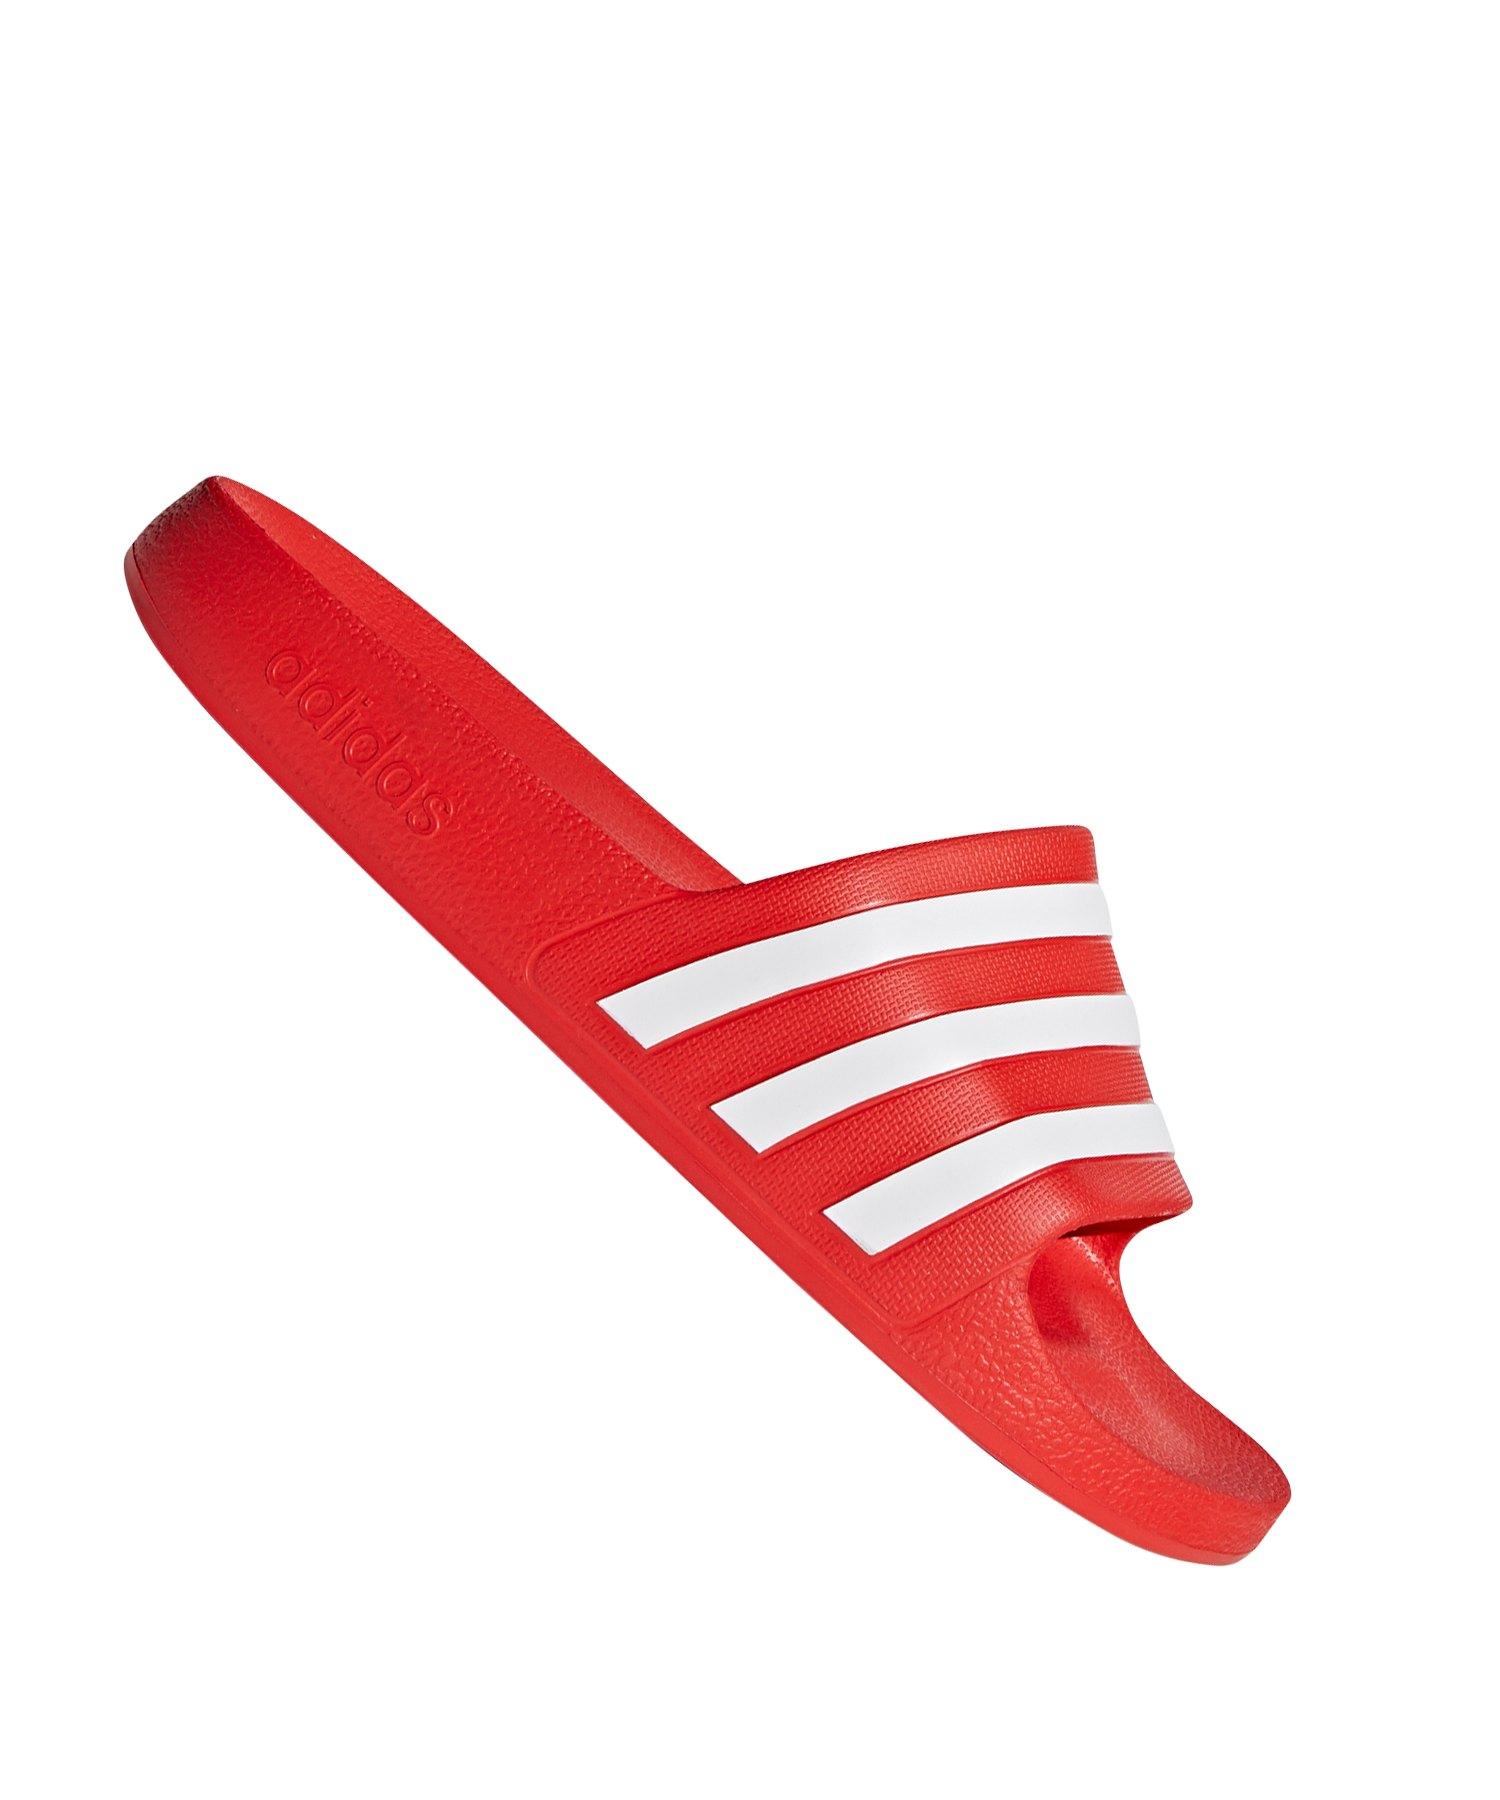 adidas Adilette Aqua Badelatsche Rot - rot